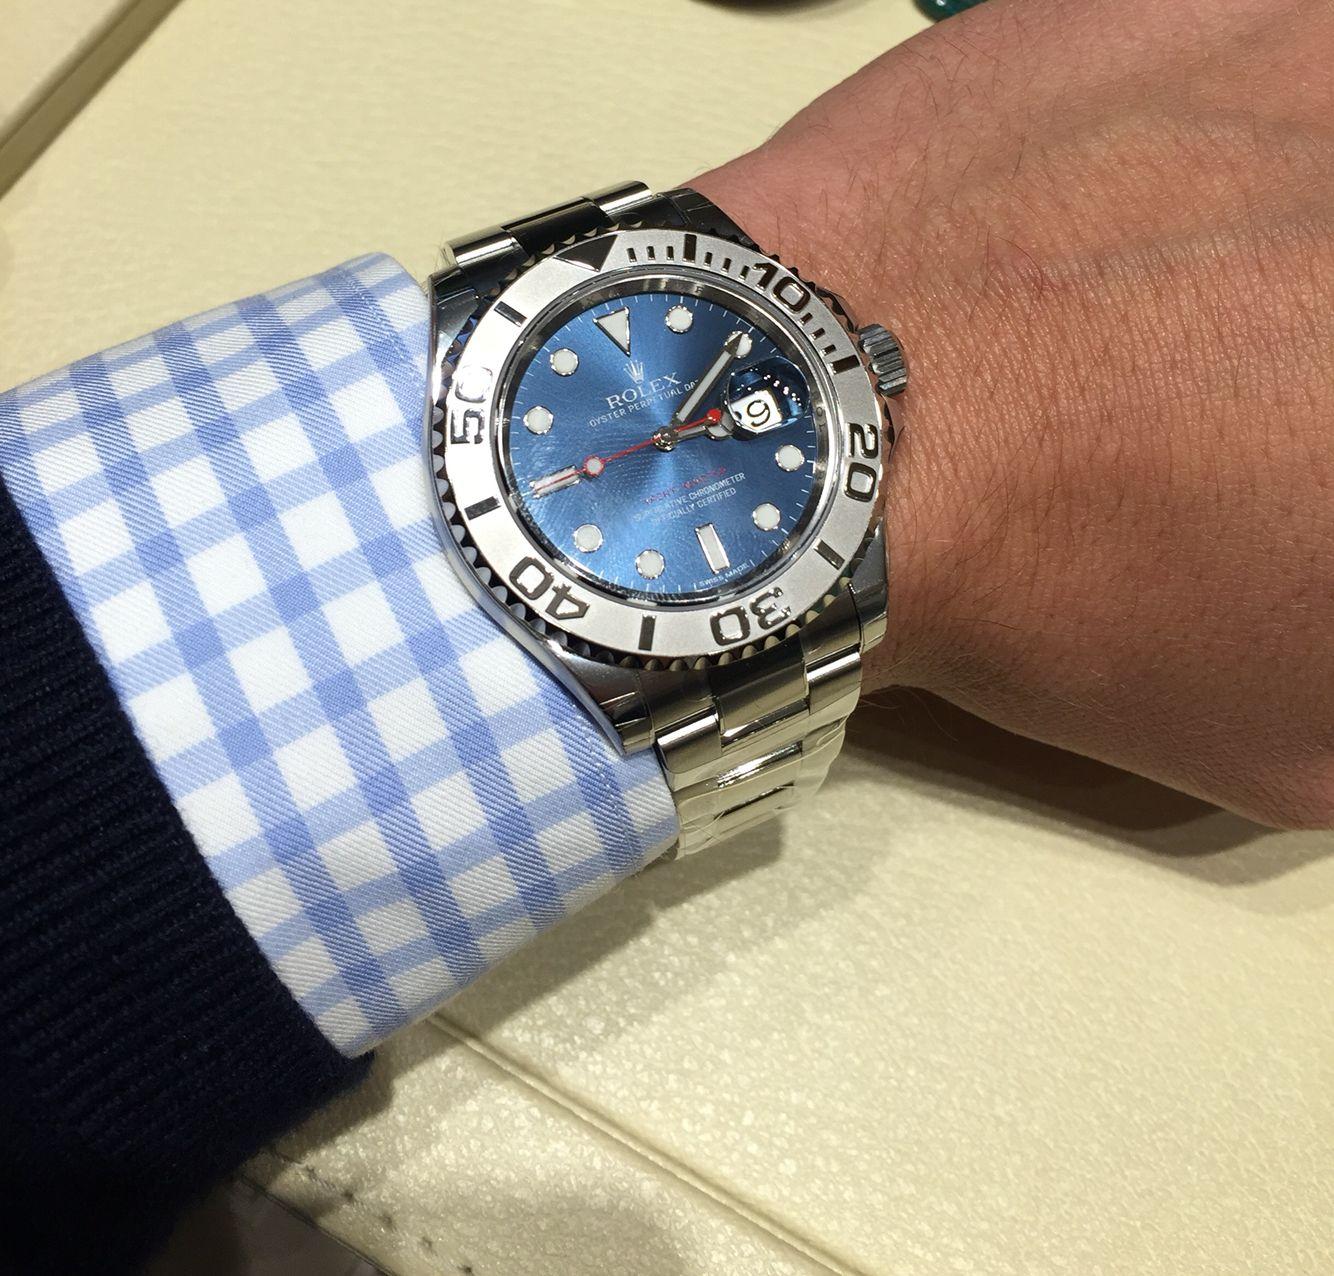 Rolex Yachtmaster (116622) blue dial, 40mm, platinum bezel